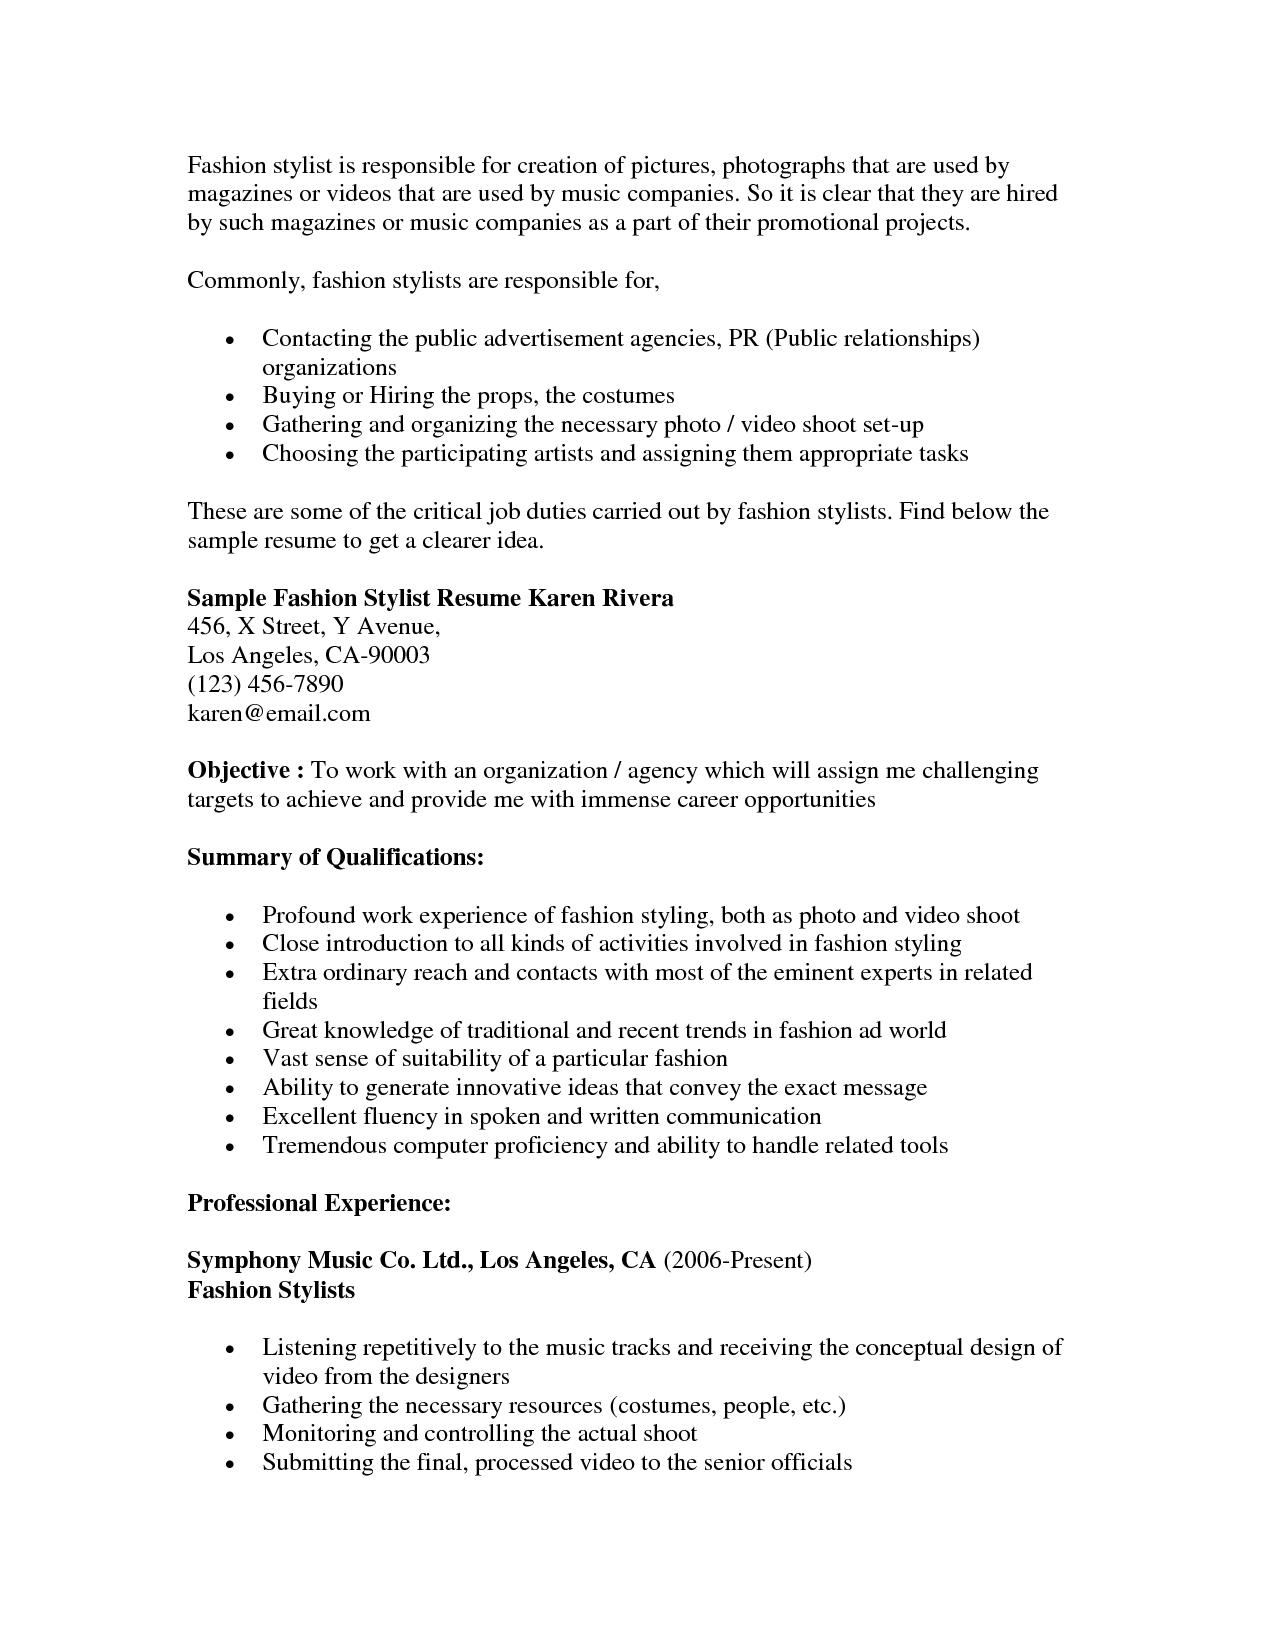 fashion stylist resume objective resumecareer info - Fashion Stylist Resume